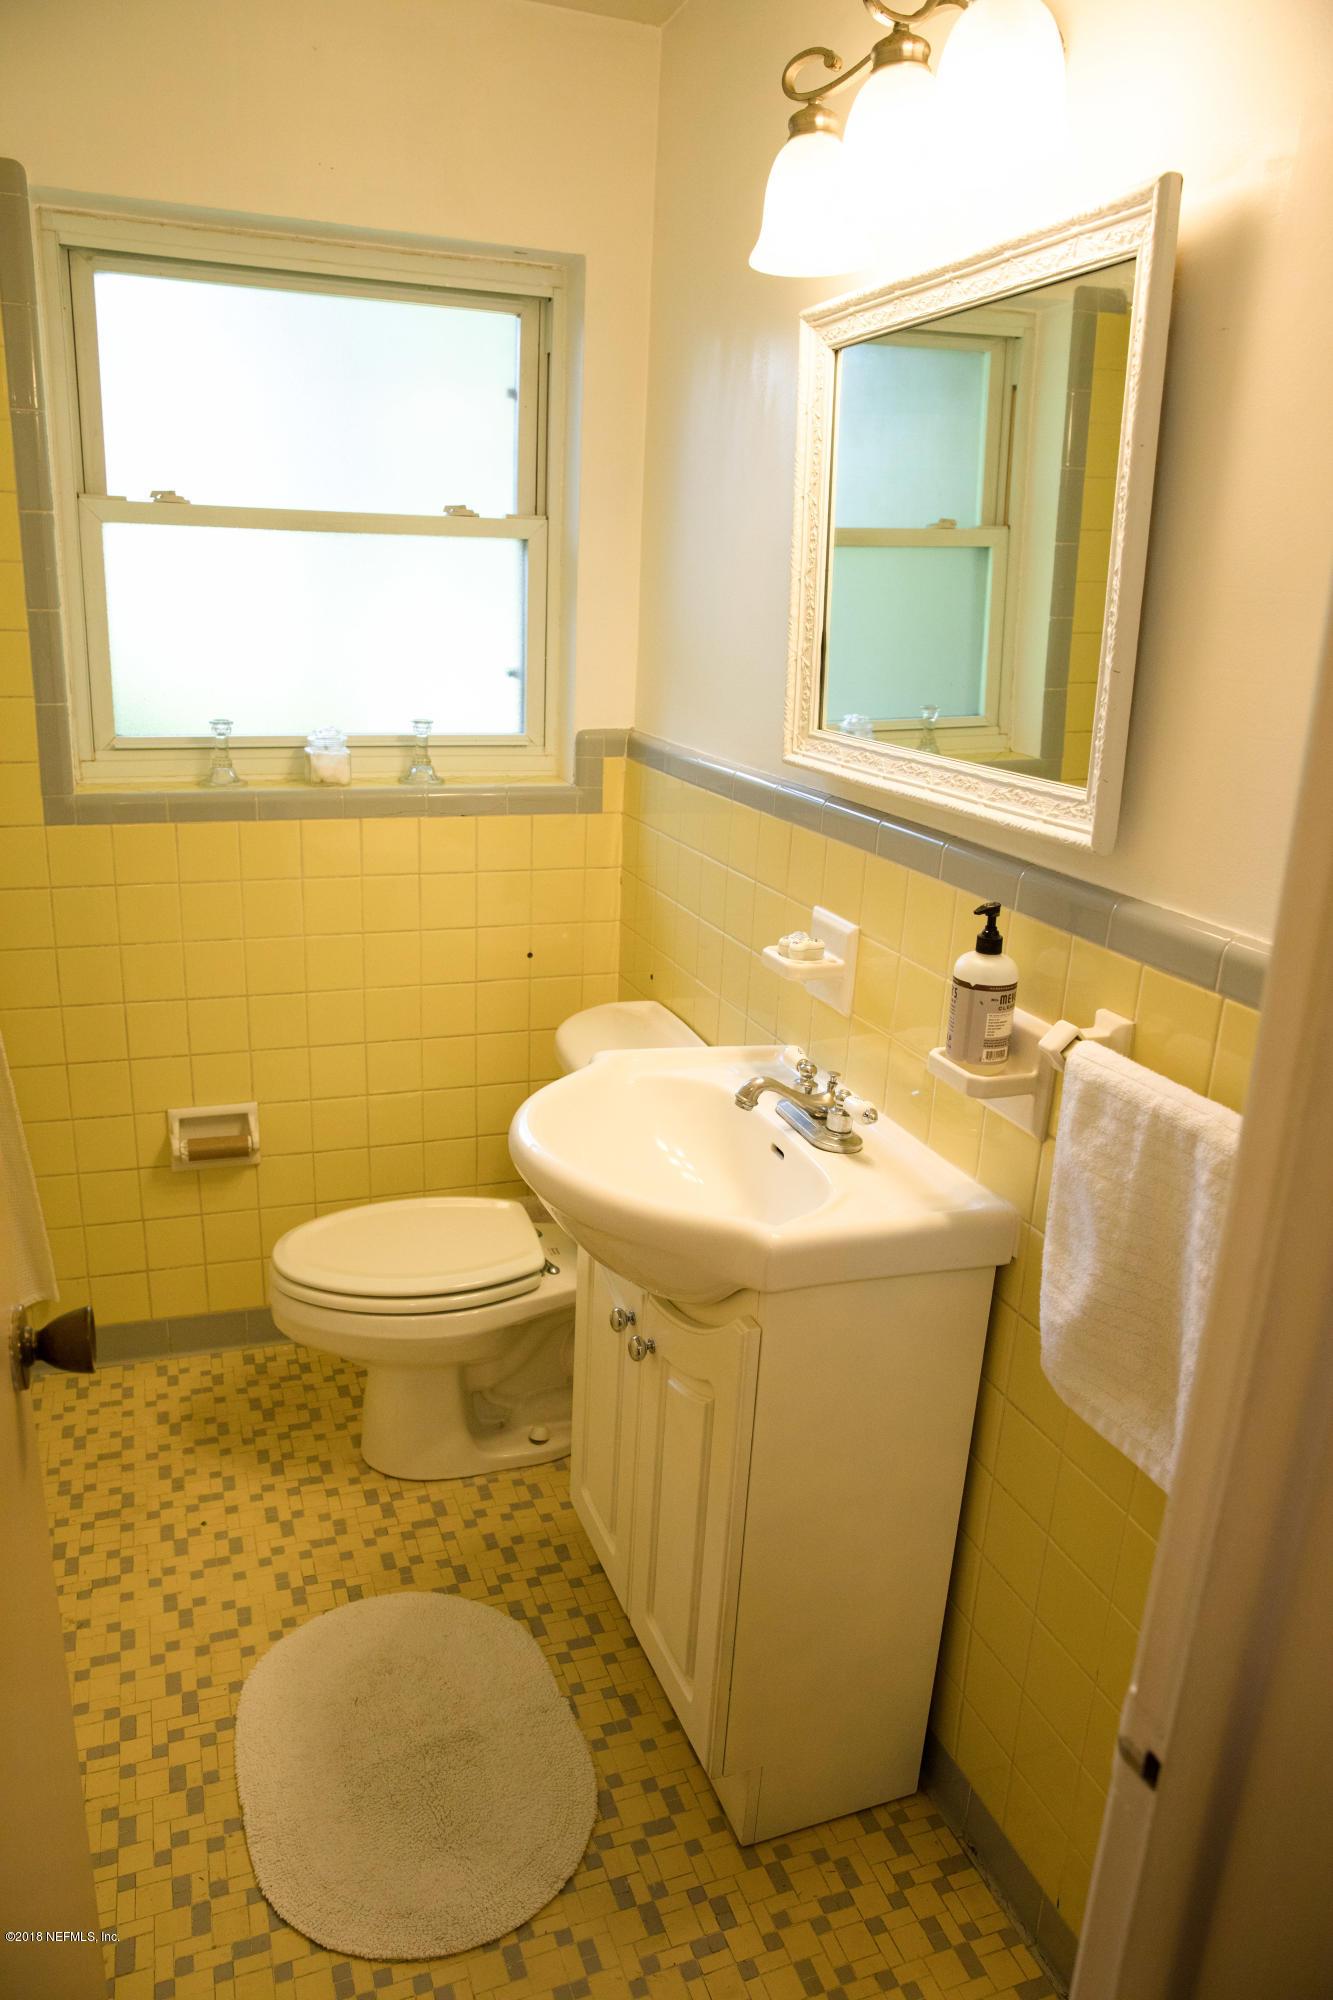 6104 BARTRAM, JACKSONVILLE, FLORIDA 32216, 2 Bedrooms Bedrooms, ,2 BathroomsBathrooms,Residential - single family,For sale,BARTRAM,947373